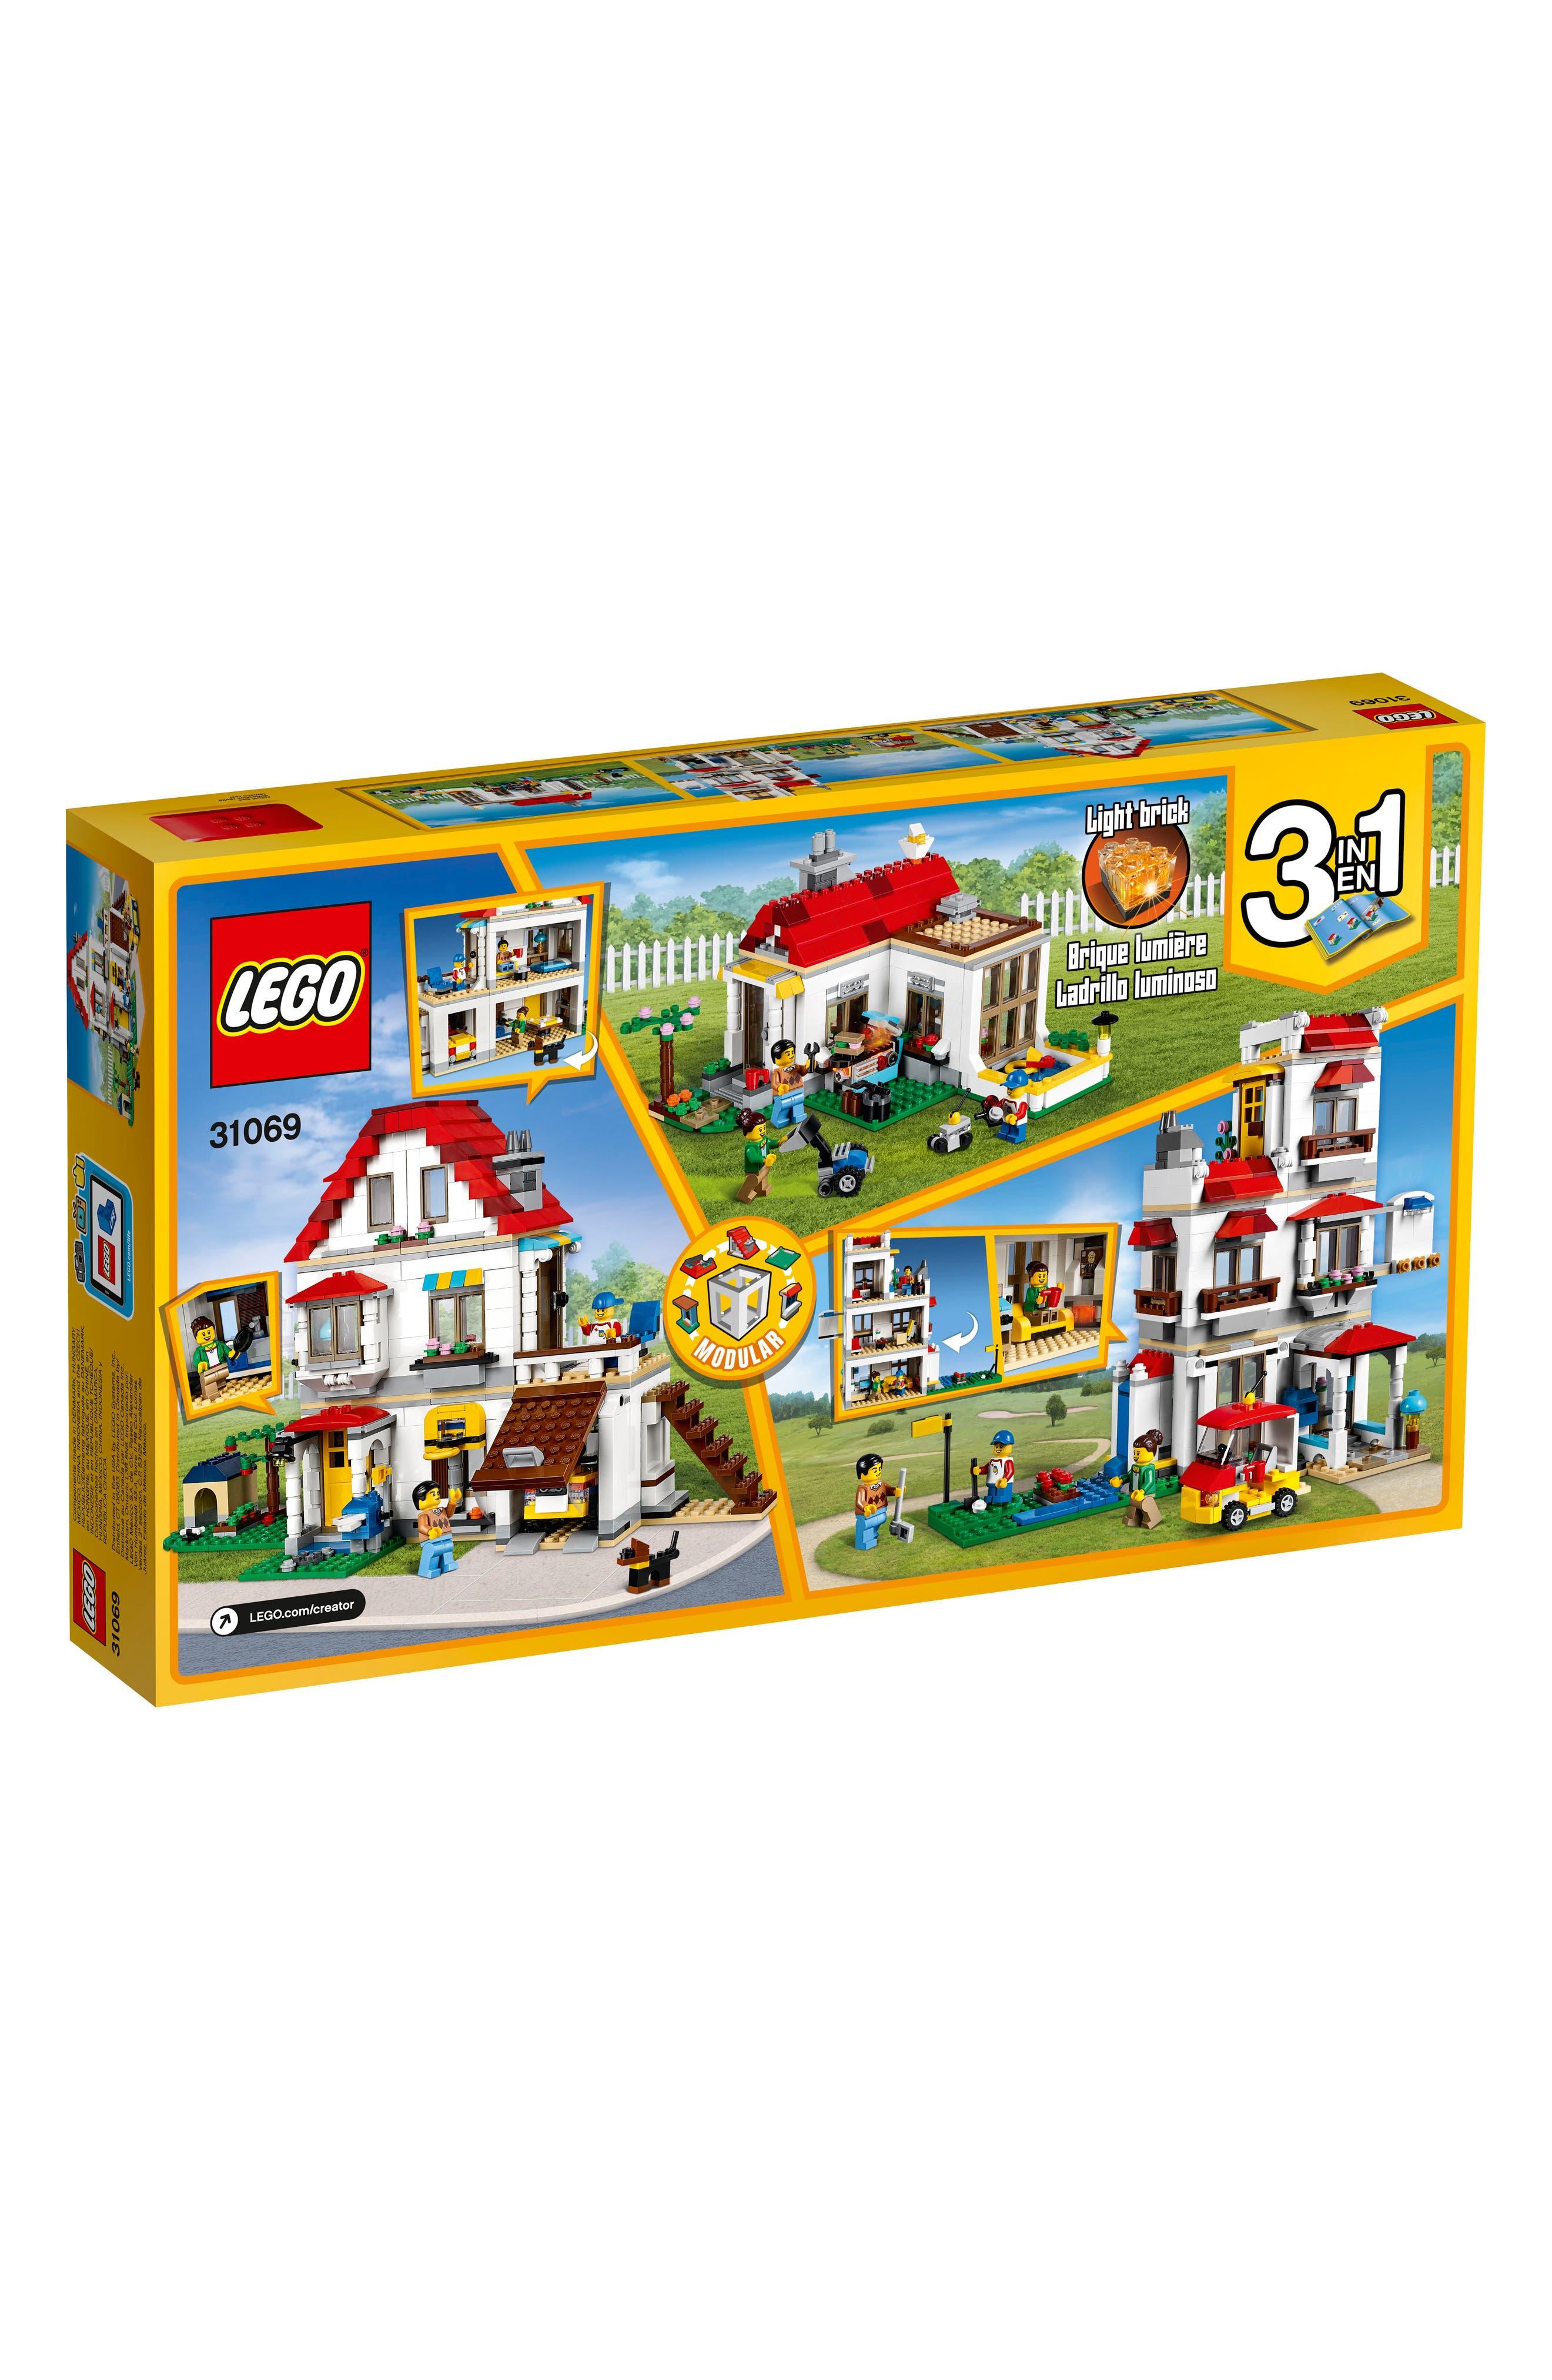 Creator Modular Family Villa Play Set - 31069,                         Main,                         color, Multi